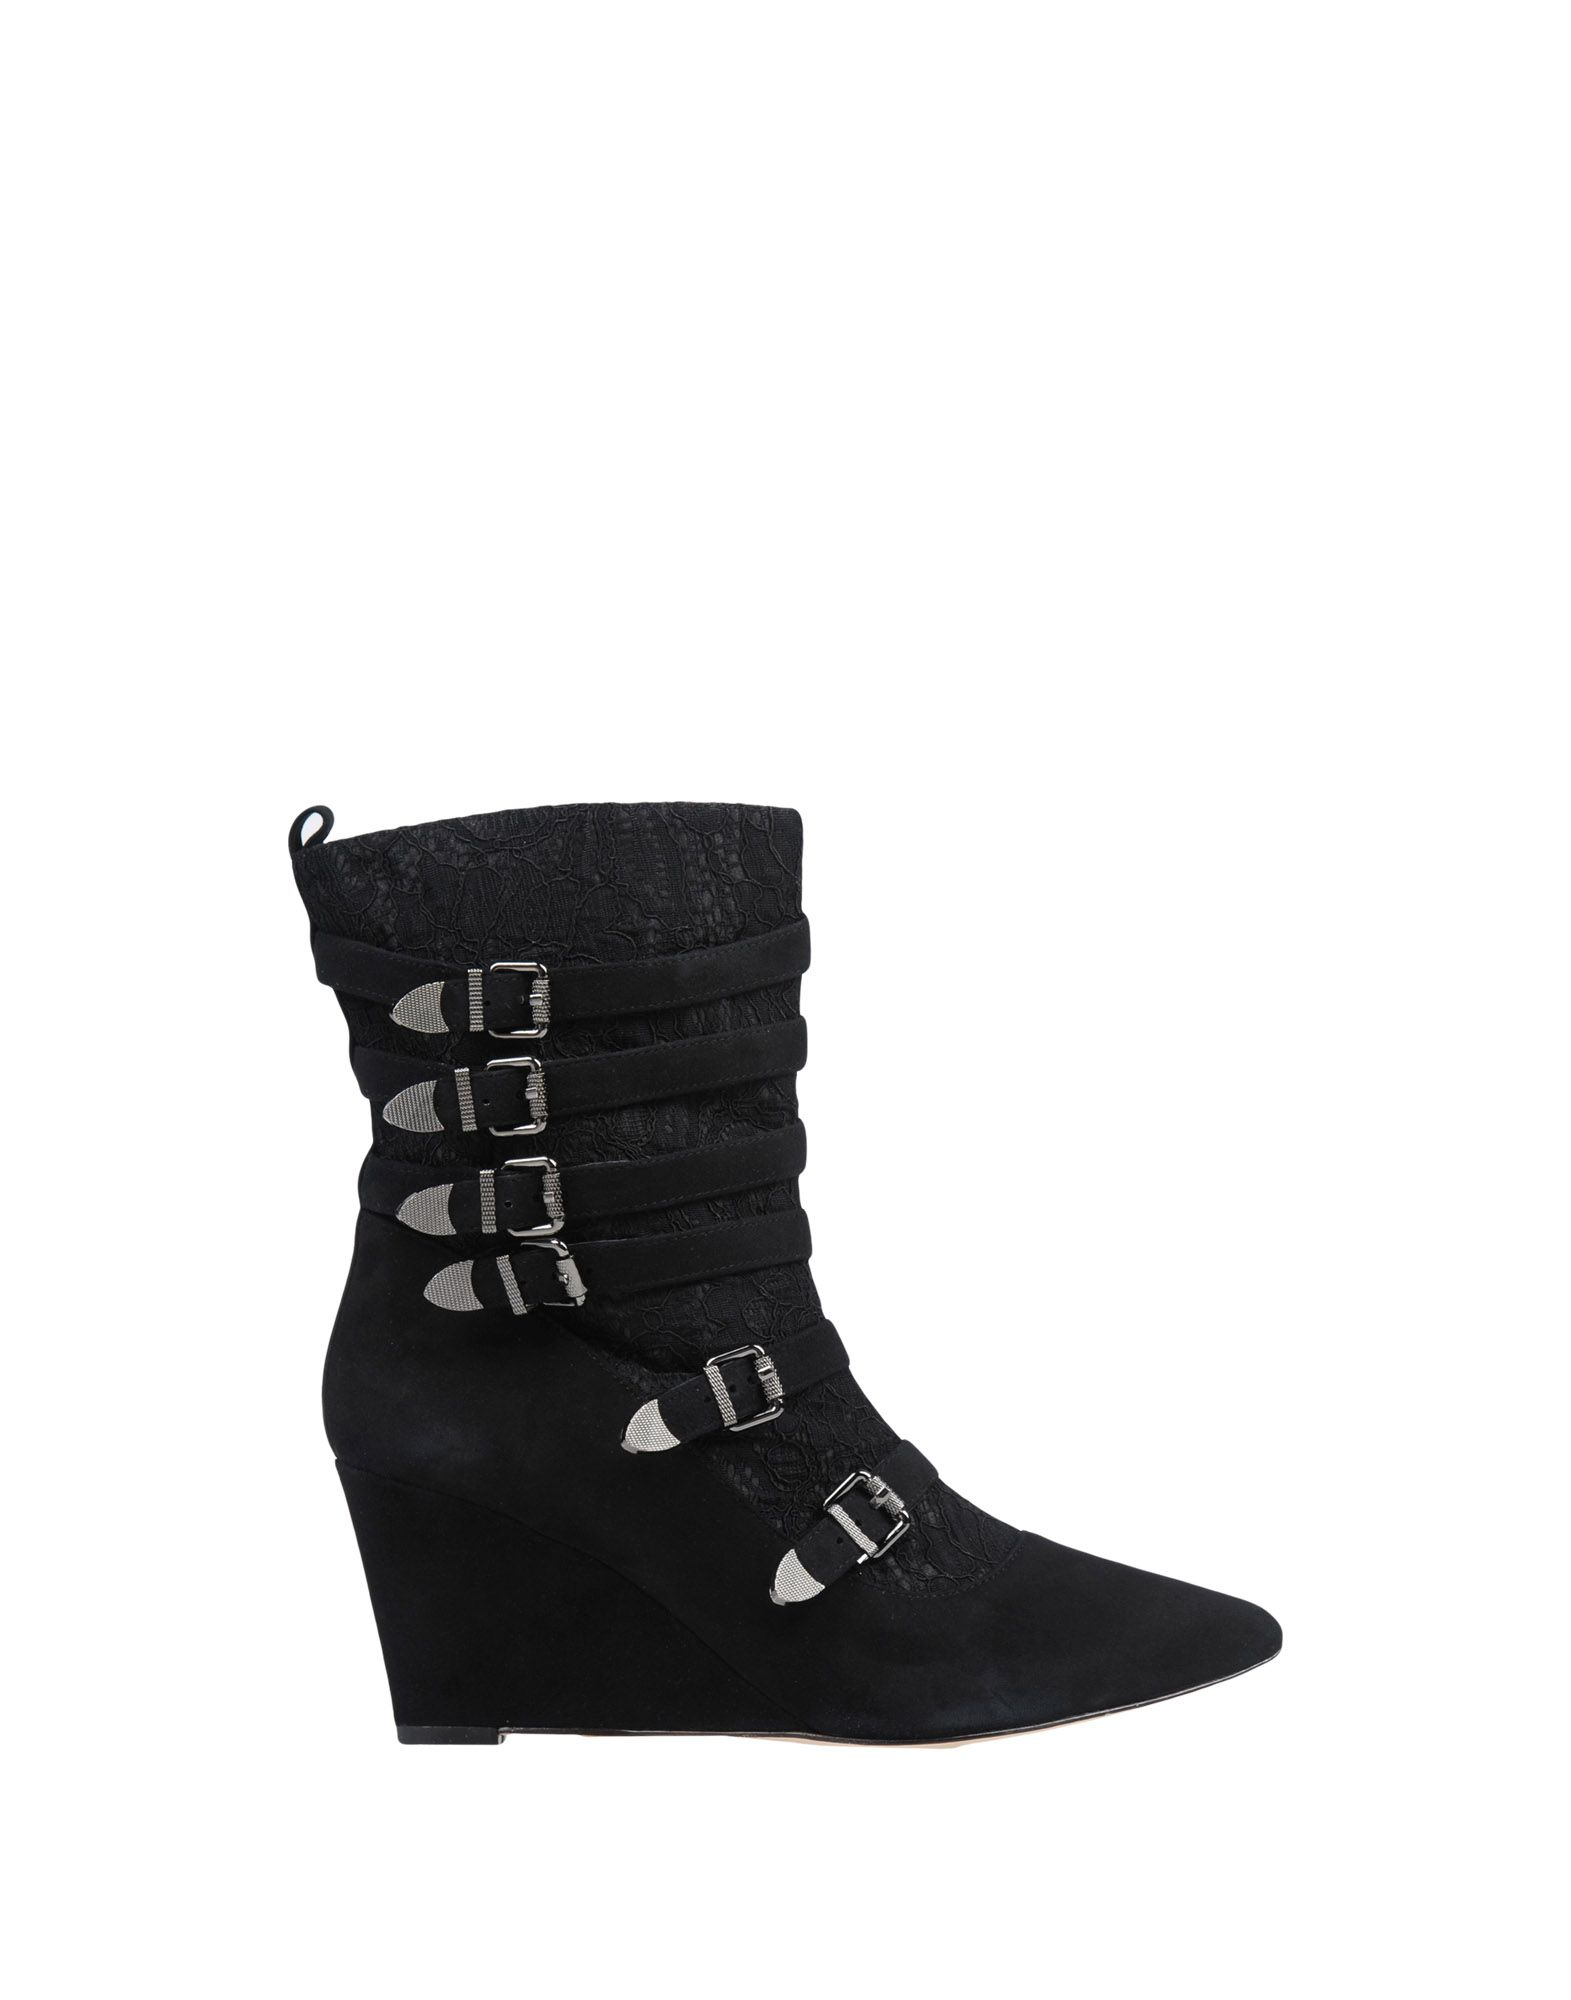 LUCY CHOI London Полусапоги и высокие ботинки цена и фото